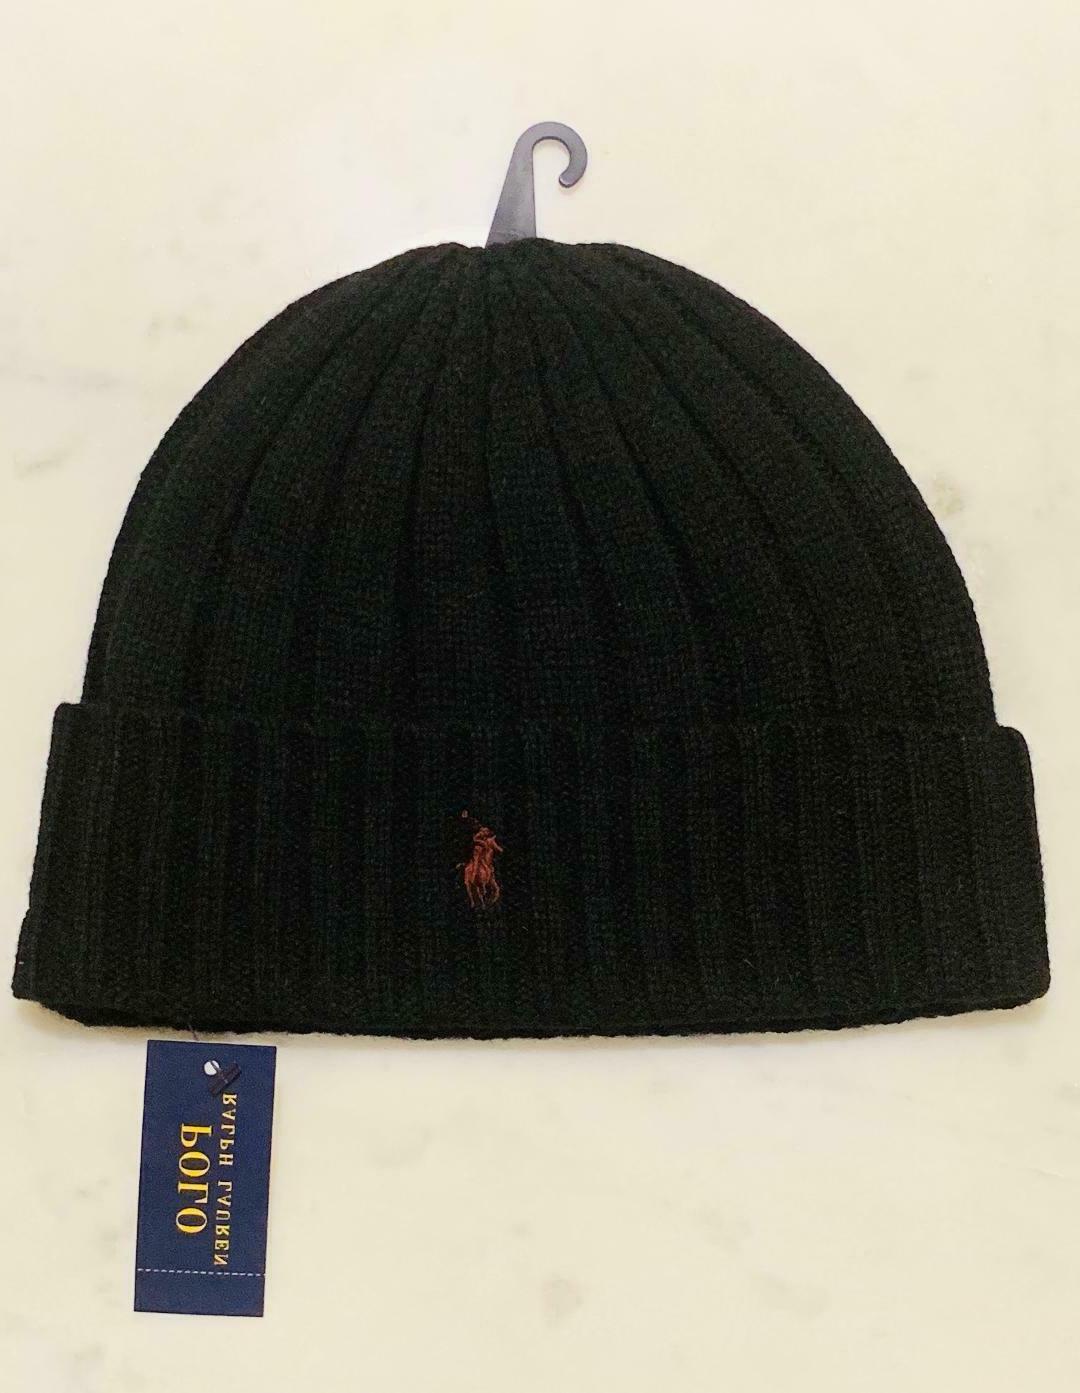 Polo Wool Cuffed Ribbed Pony Logo PP0054 NEW NWT Ski hat